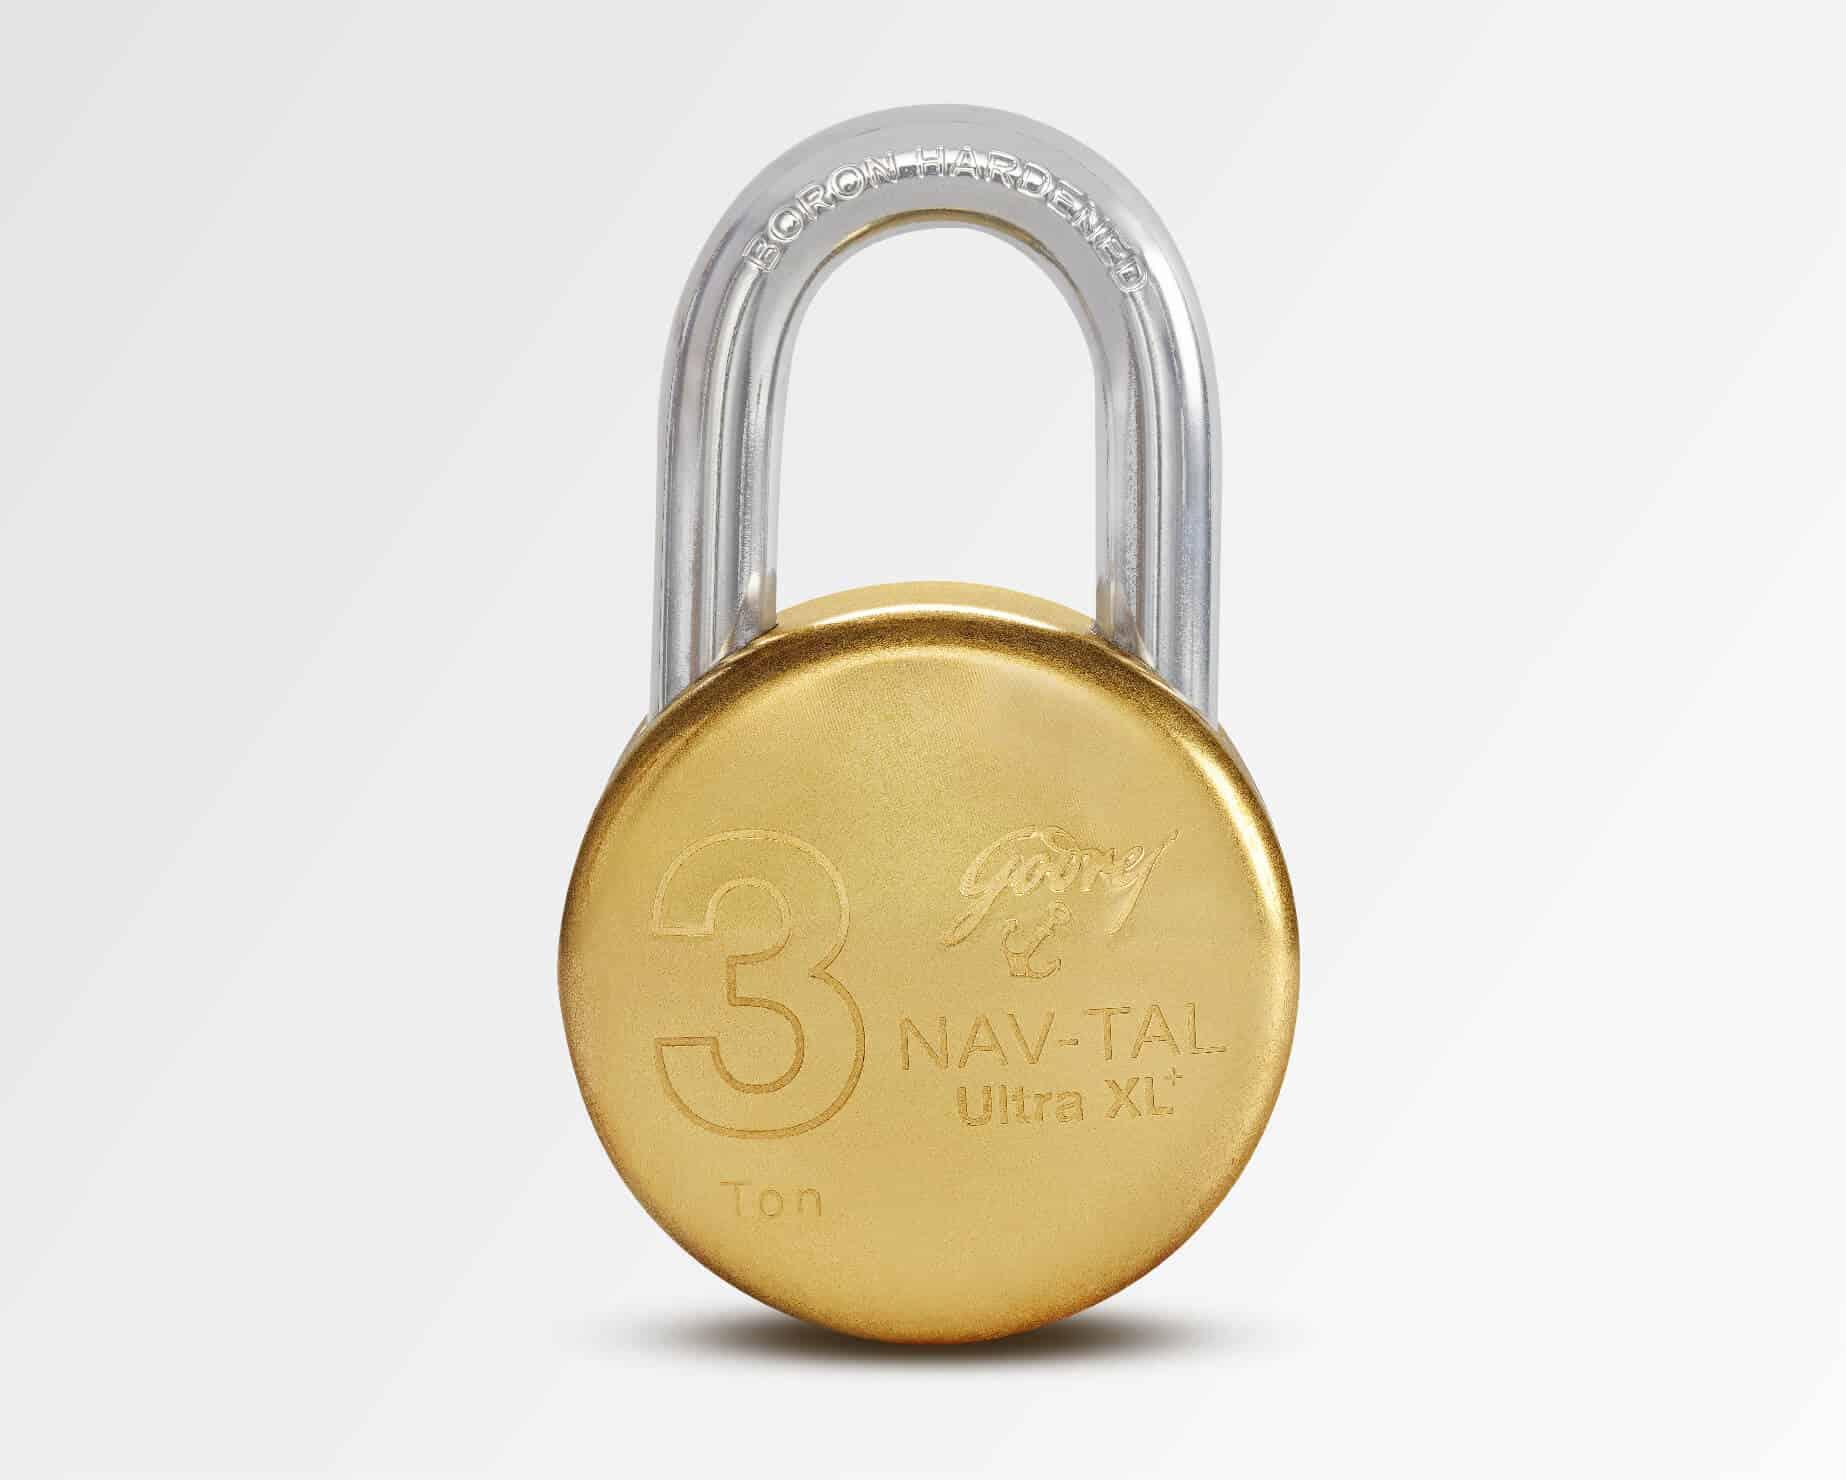 padlock, godrej locks